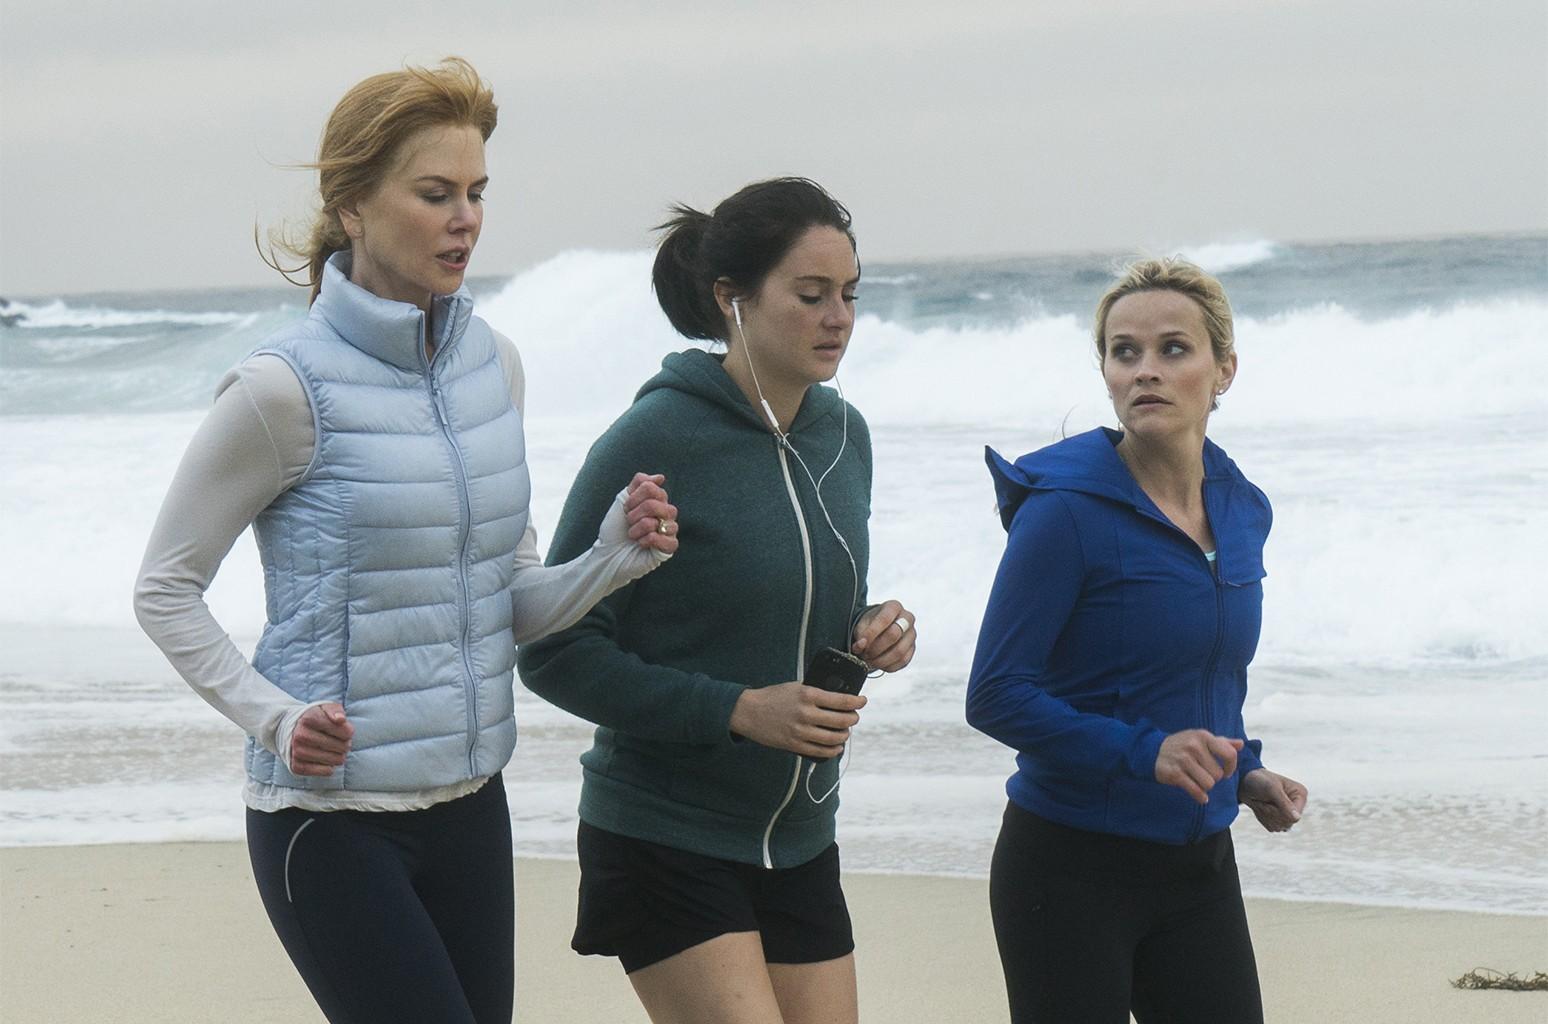 Nicole Kidman, Shailene Woodley, Reese Witherspoon in Big Little Lies.